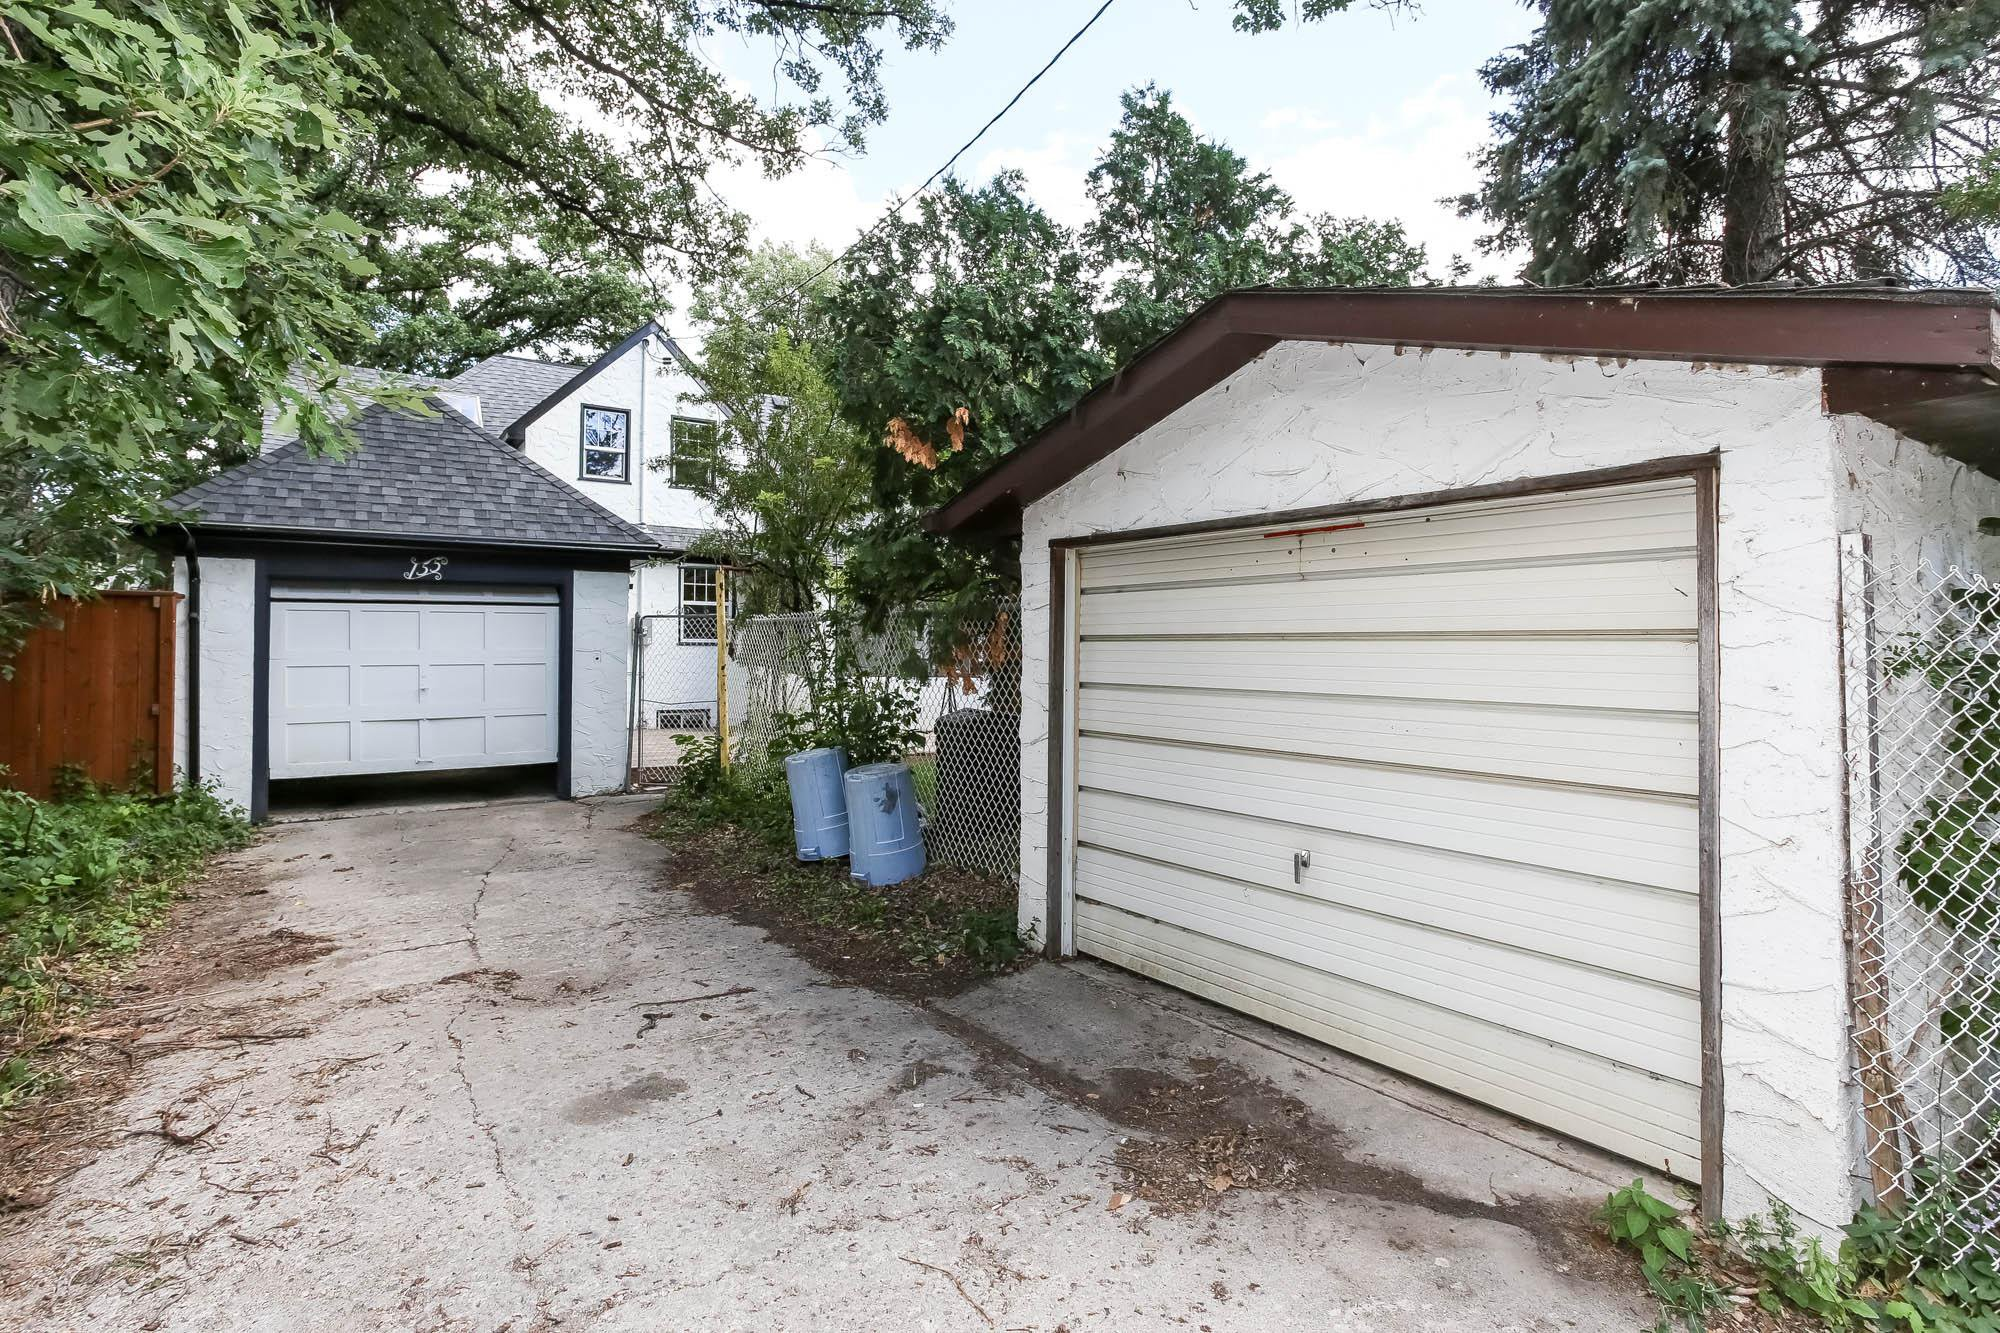 Photo 33: Photos: 155 Borebank Street in Winnipeg: River Heights Single Family Detached for sale (1C)  : MLS®# 202017166